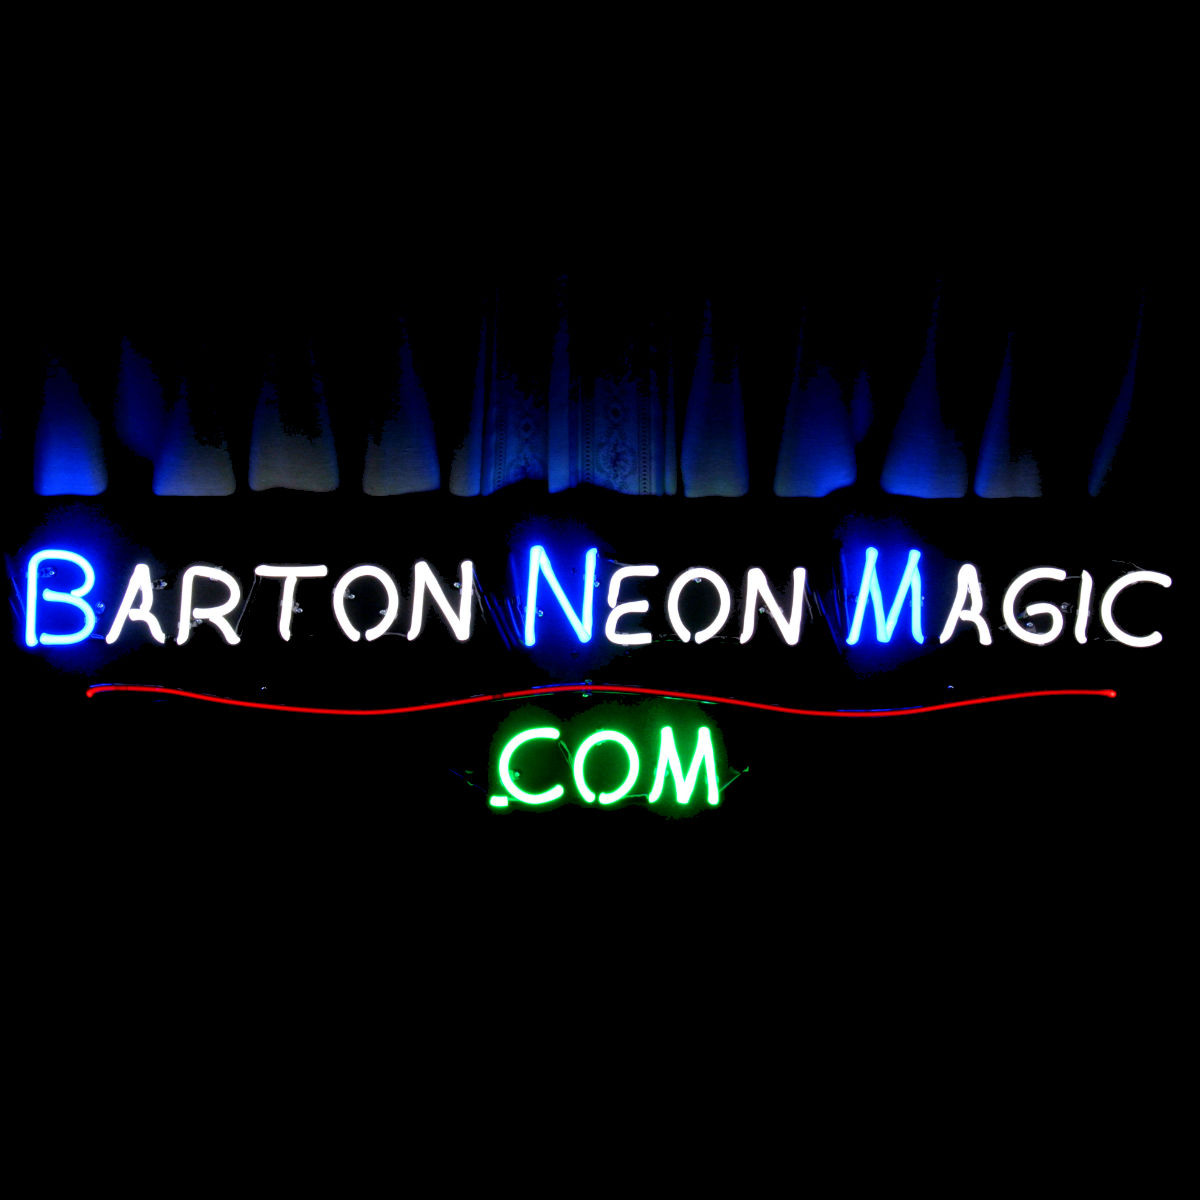 Custom Floral Neon Light Sculptures by John Barton - BartonNeonMagic.com